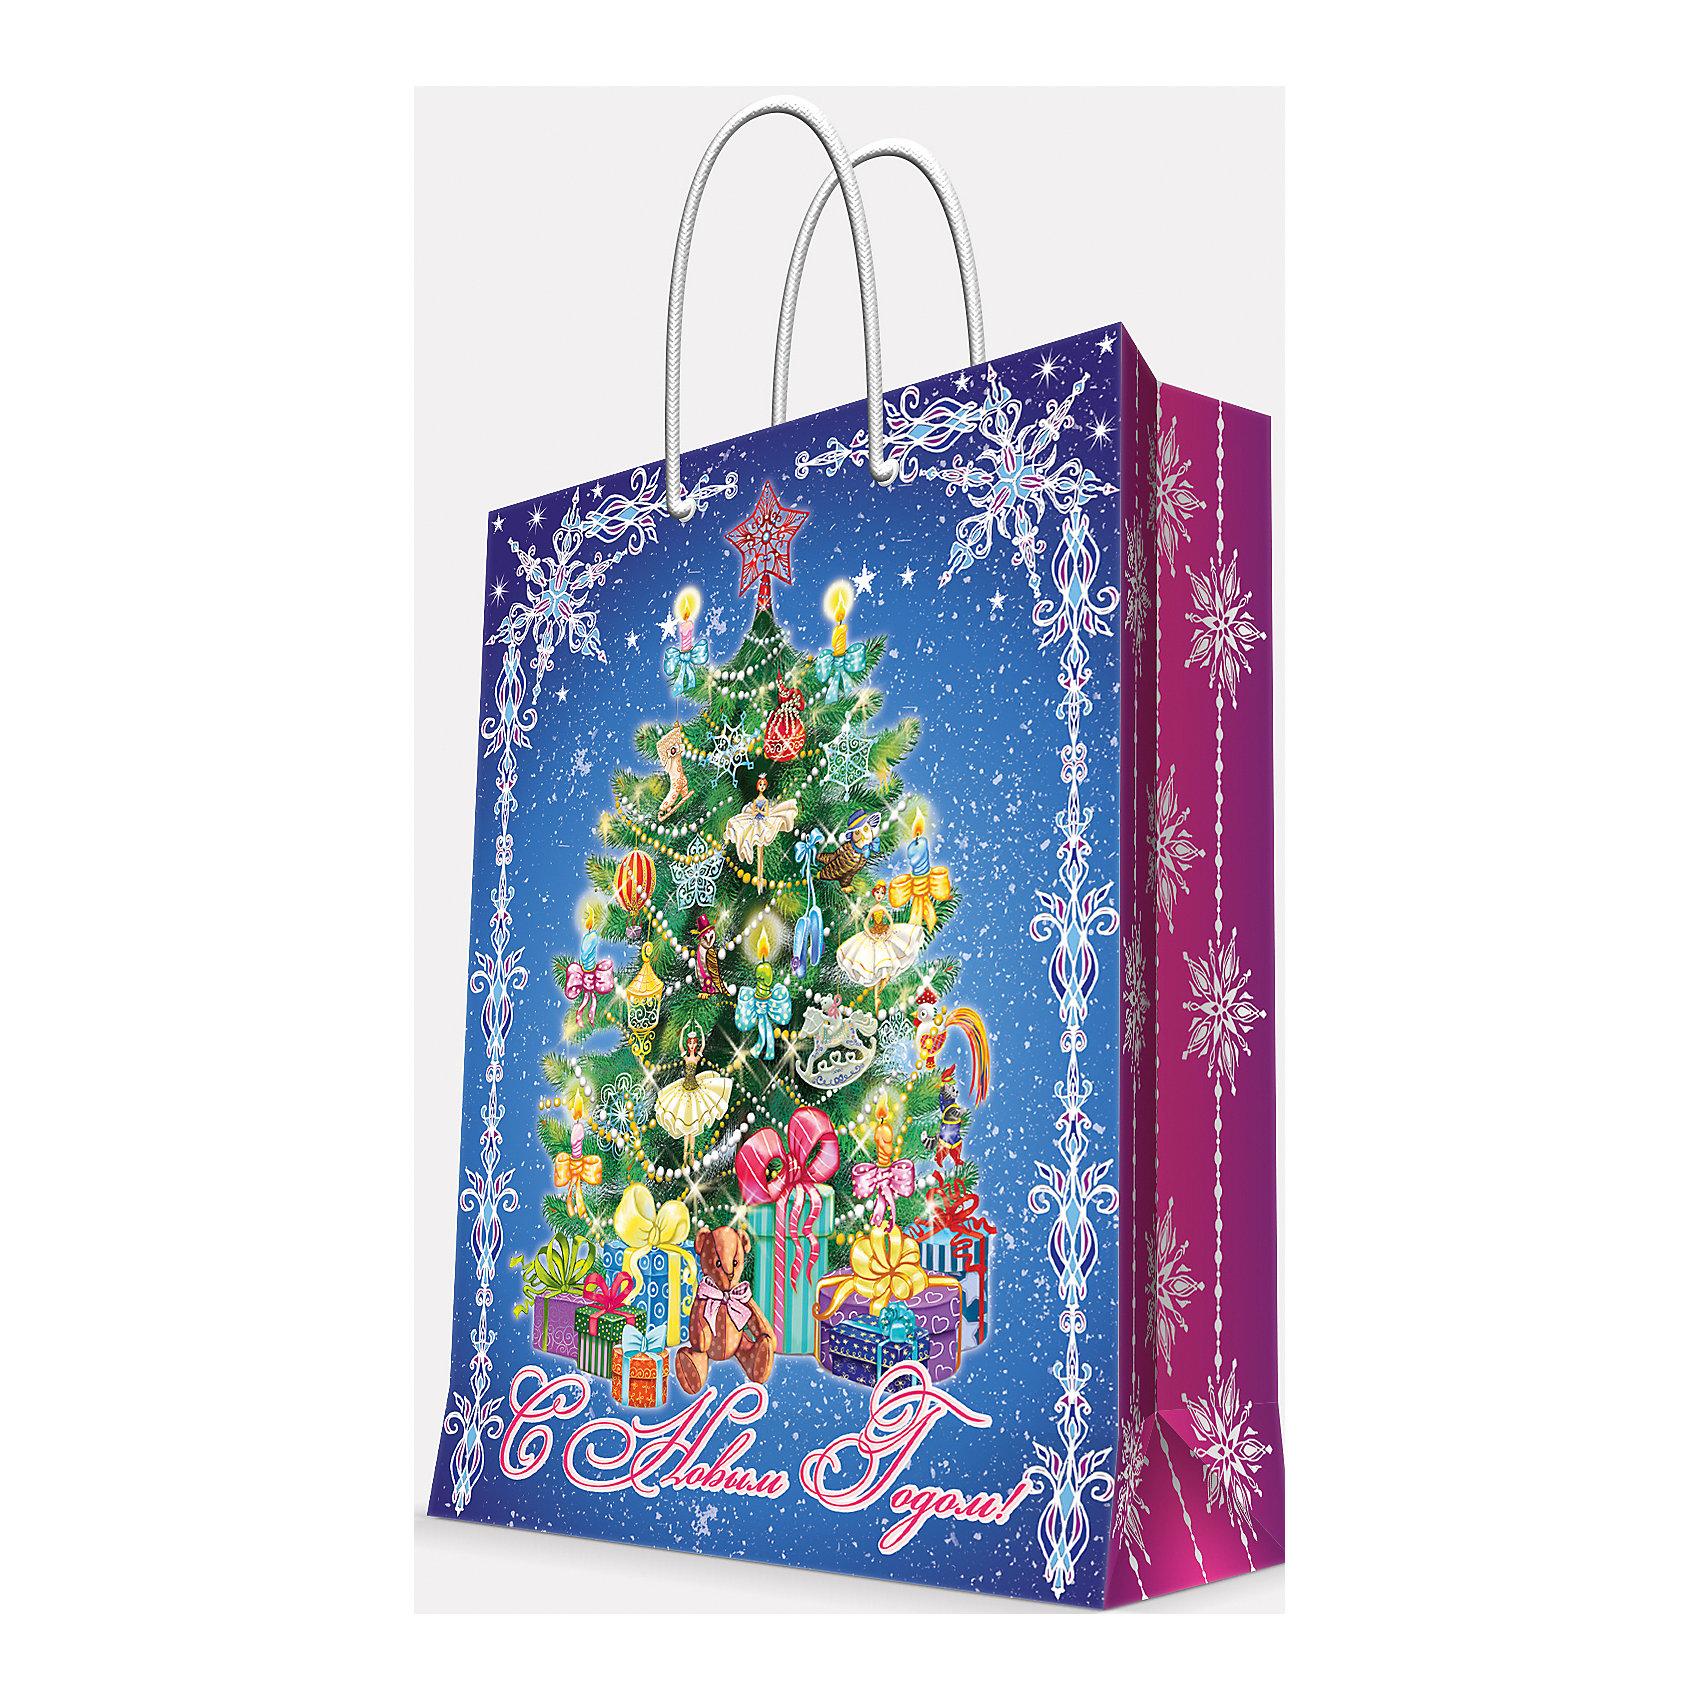 Magic Time Подарочный пакет Пушистая елочка 17,8*22,9*9,8 см magic time подарочный пакет новогодняя лампа 26 32 4 12 7 см